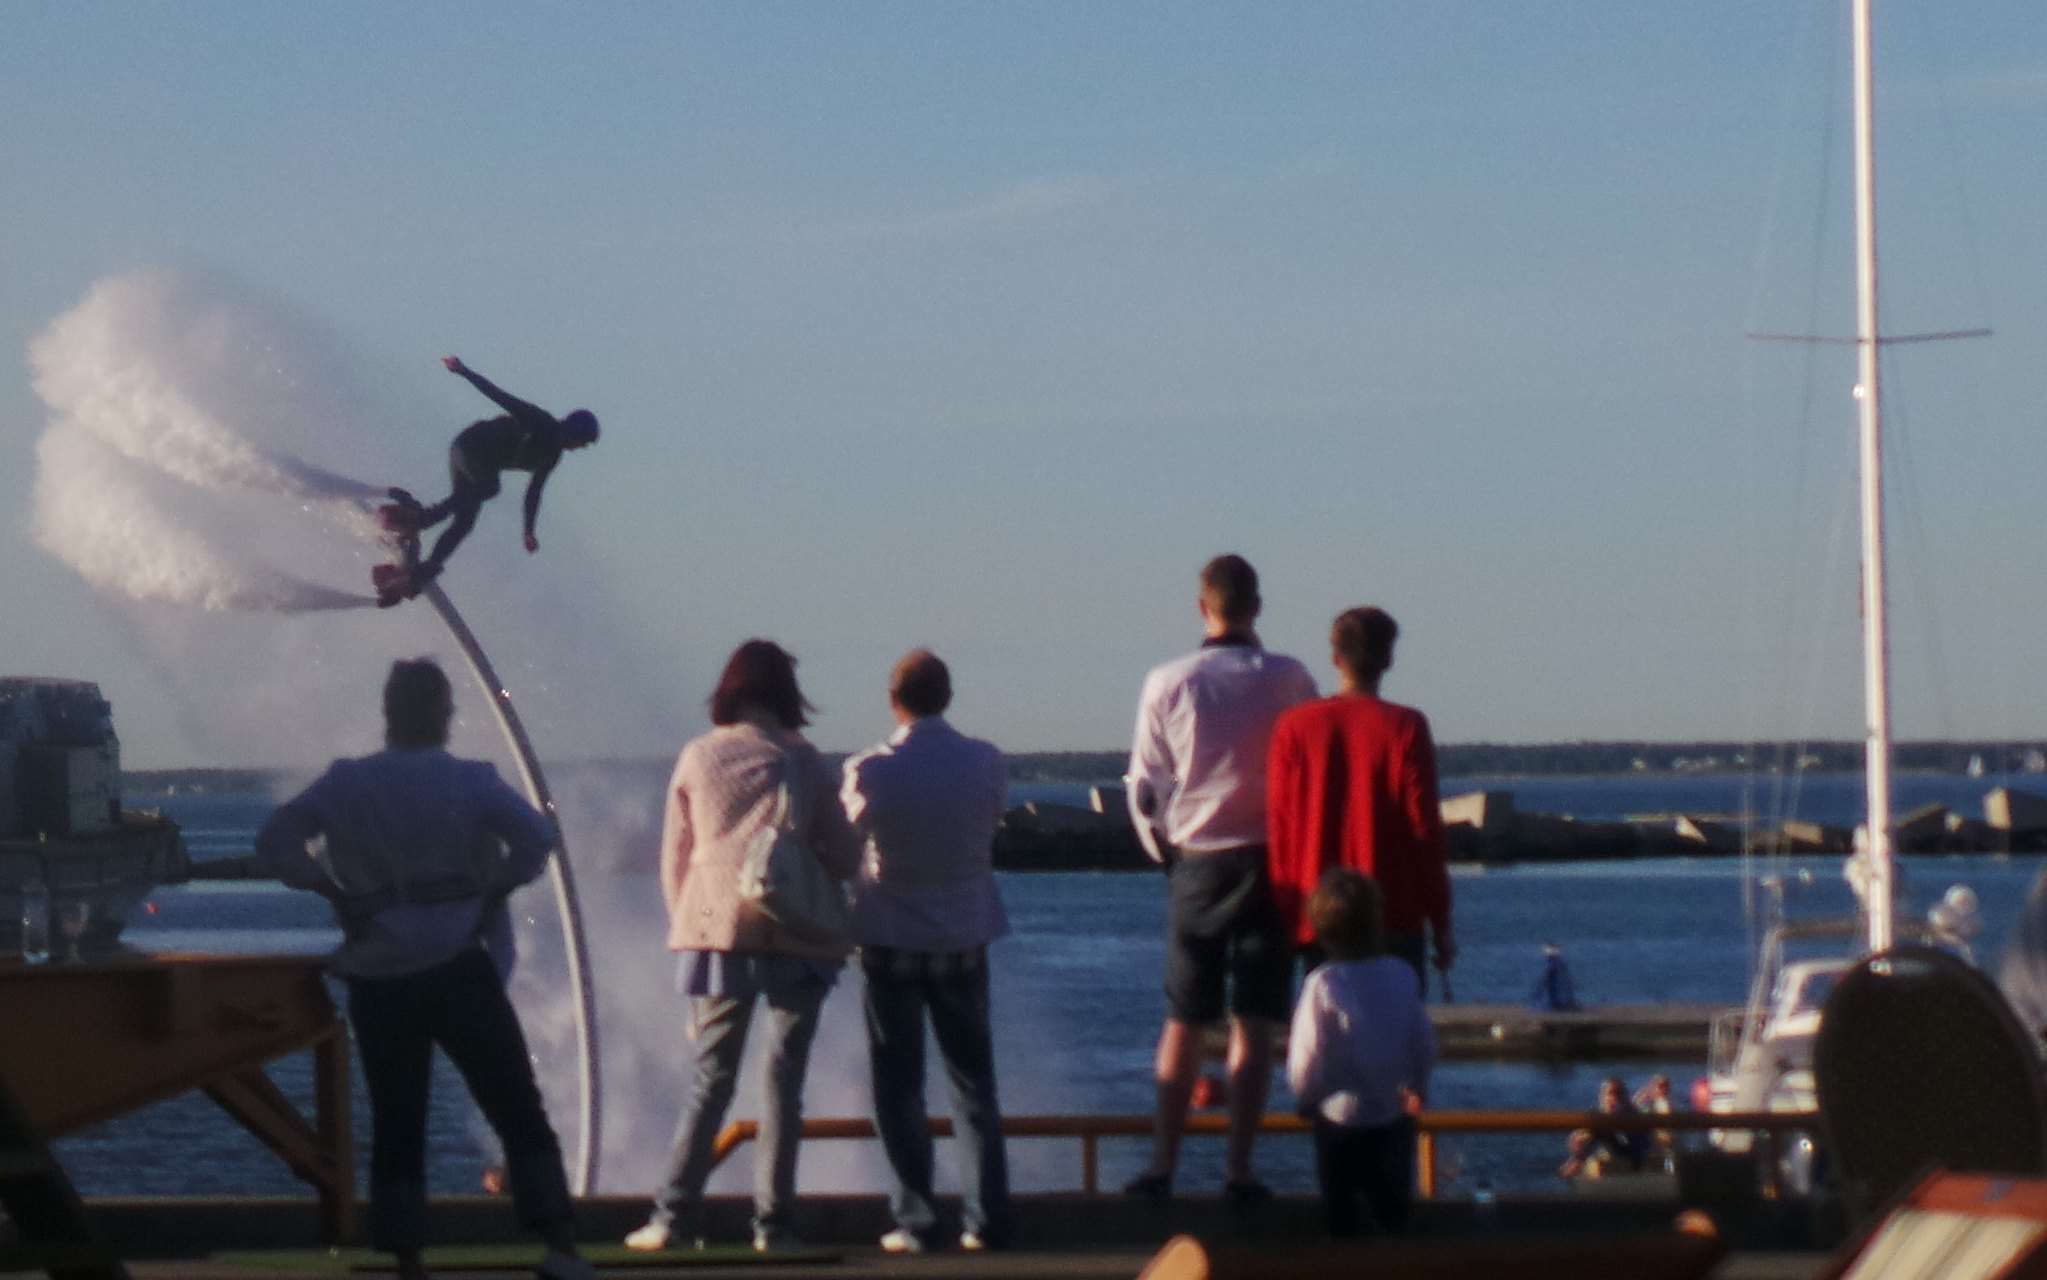 Flyboarding at Port Nobblessner. Courtesy of Visit Estonia